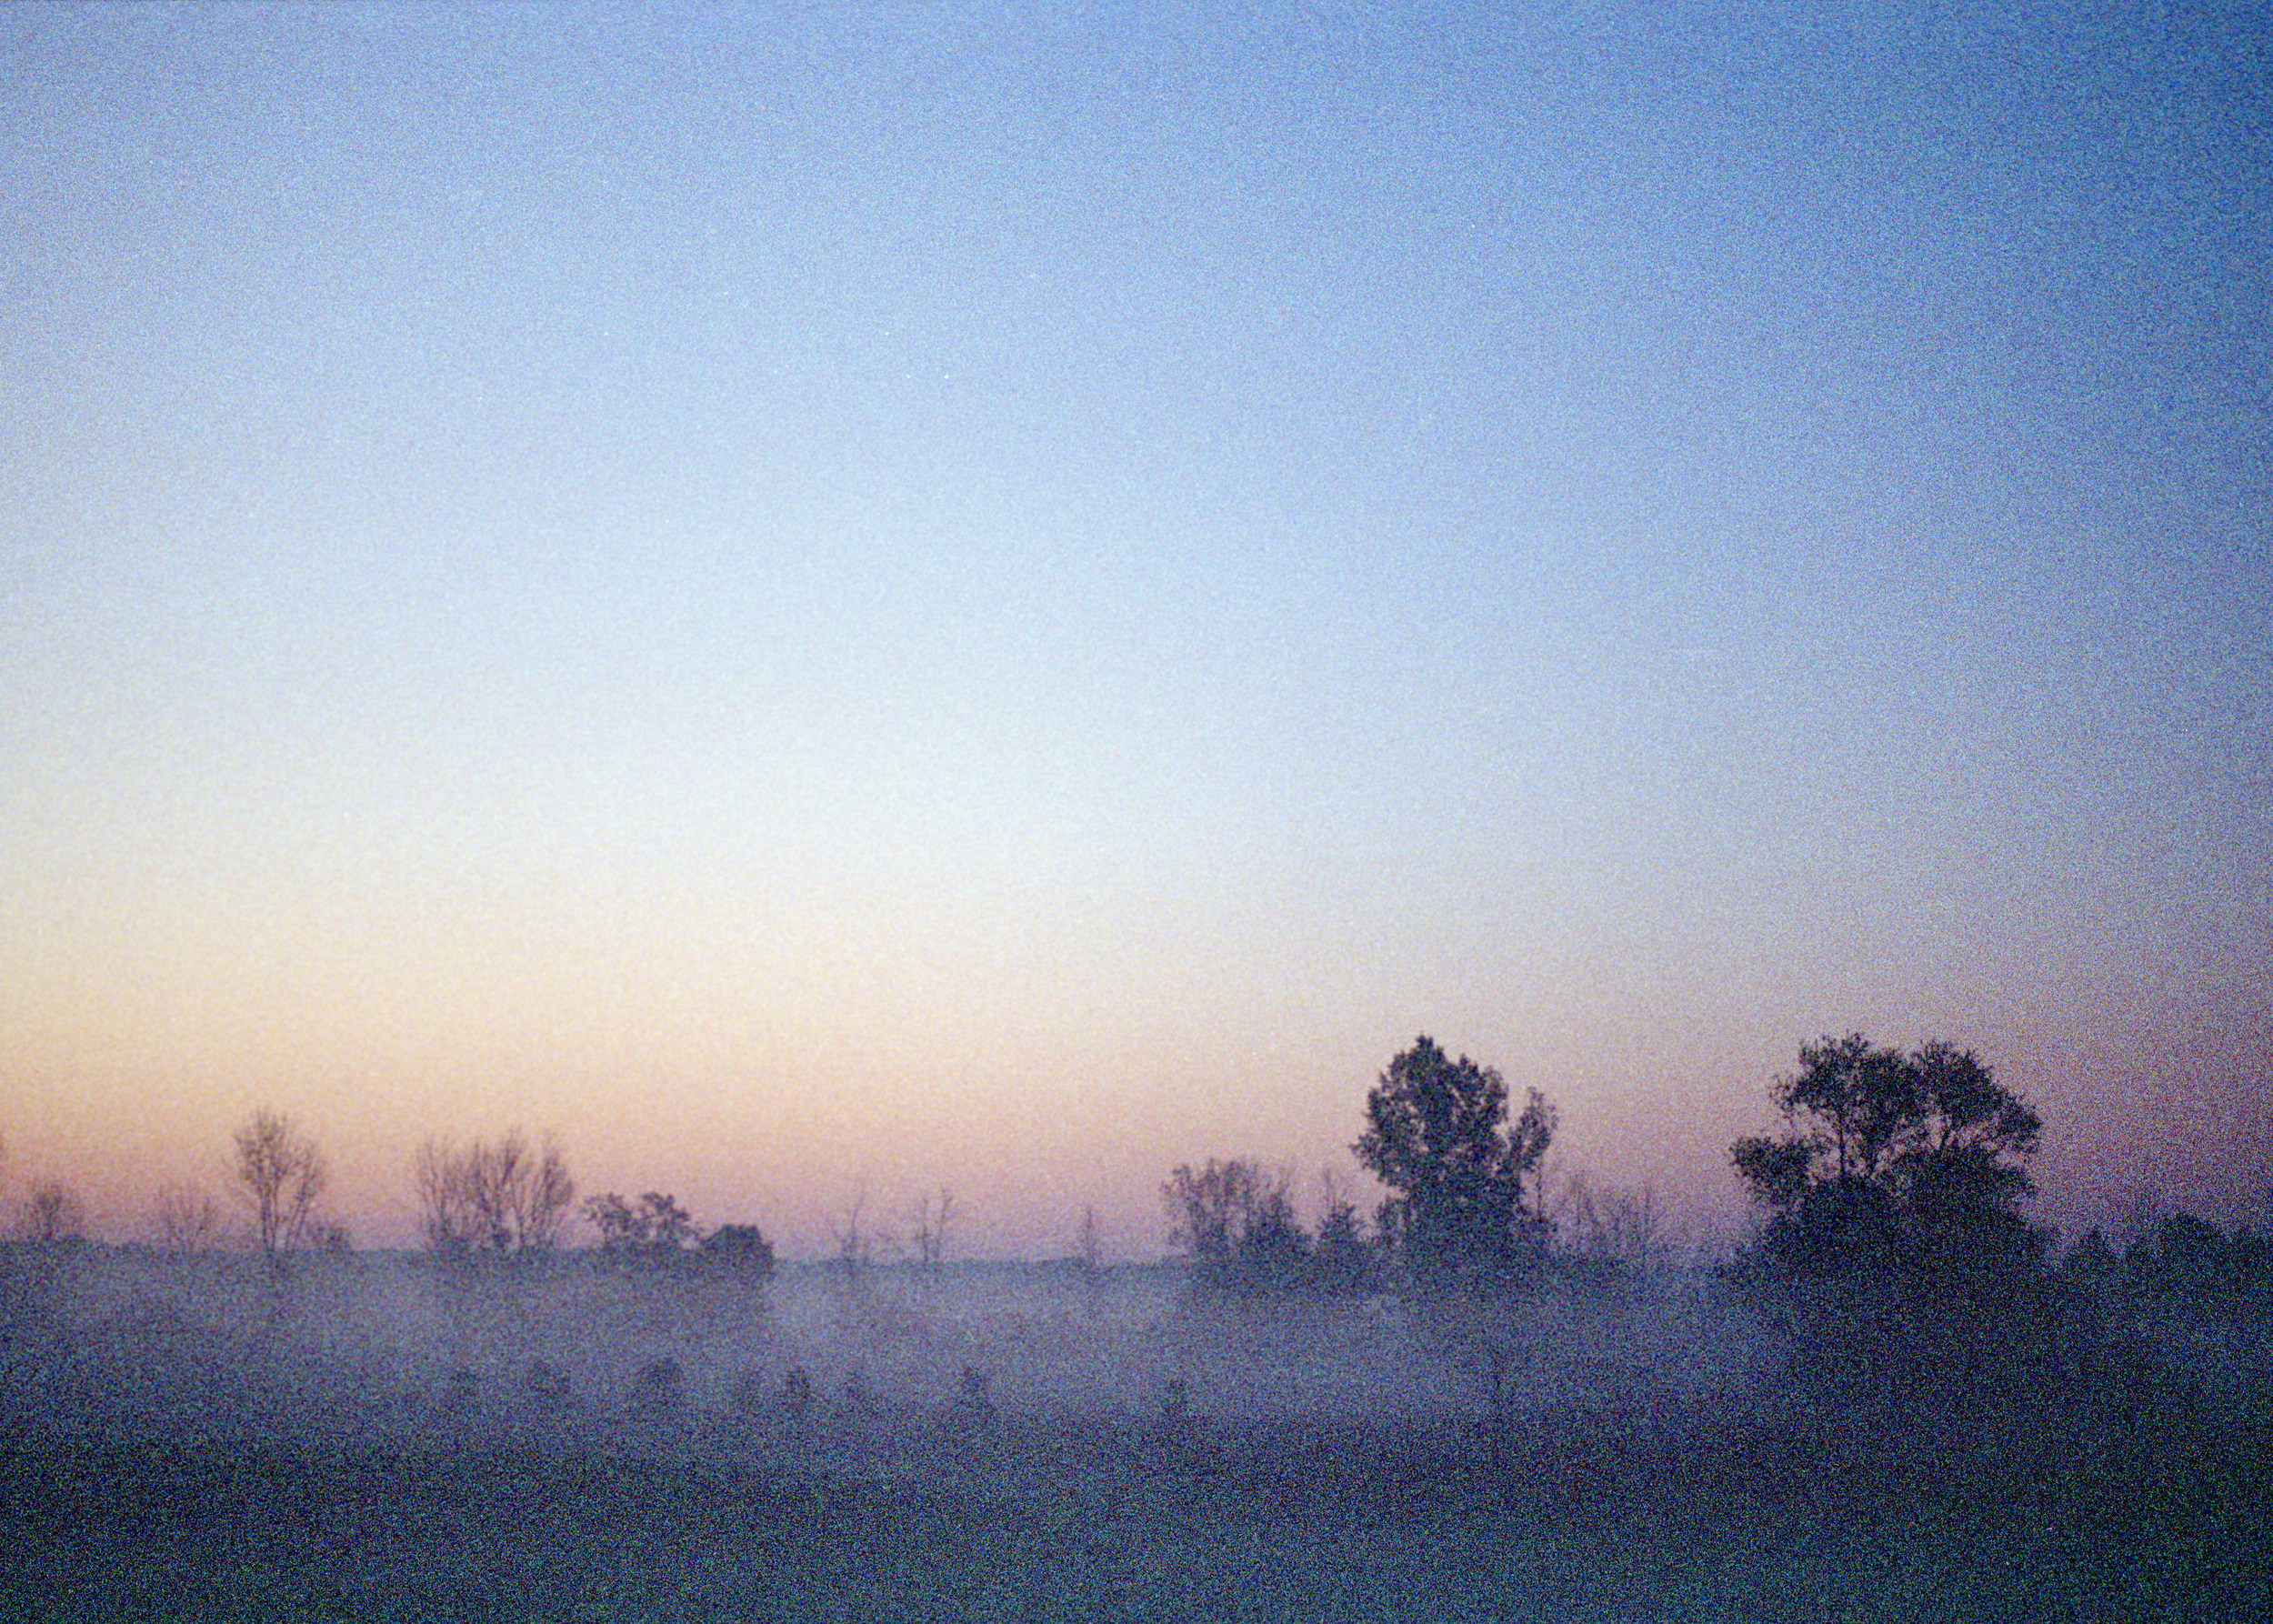 Pennellville, New York, 2012 (35mm)